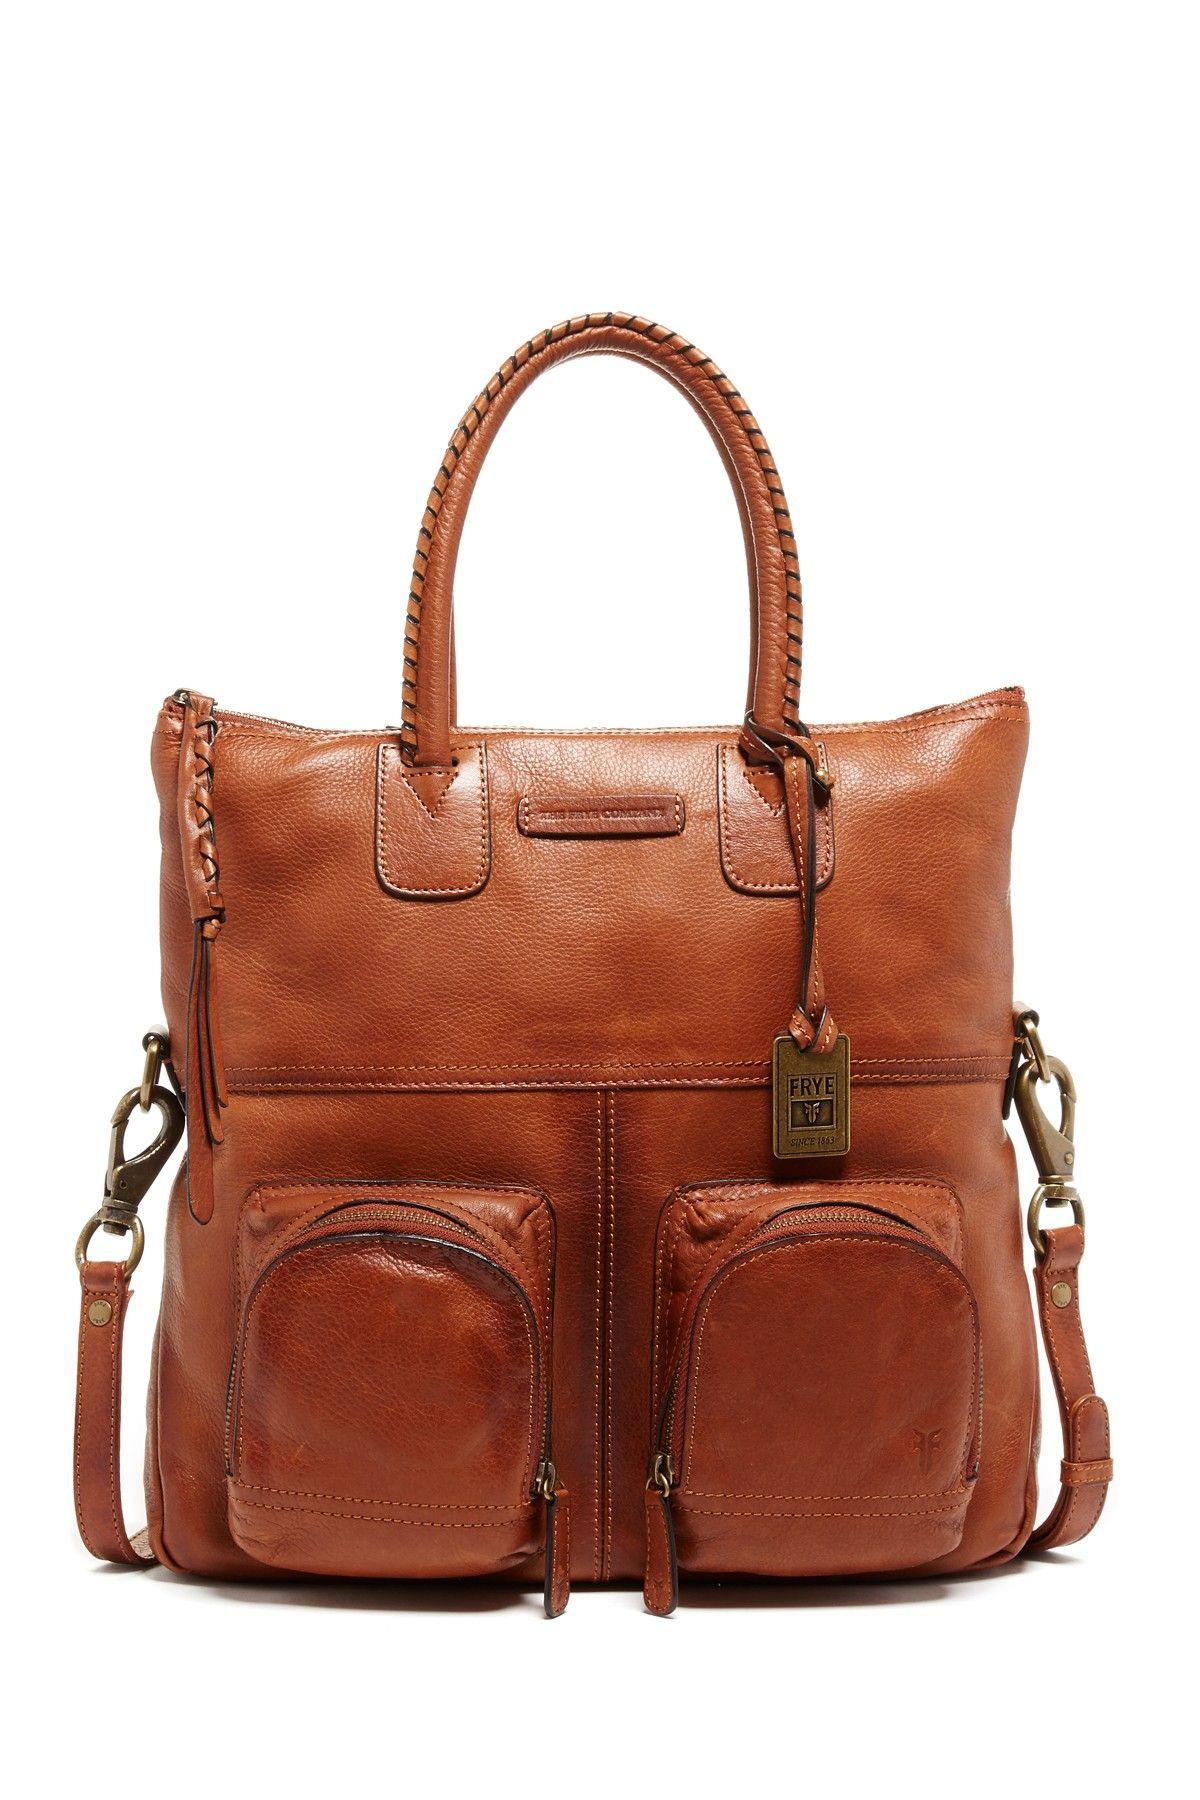 Frye Jenny Convertible Foldover Crossbody Bag Nordstrom Rack